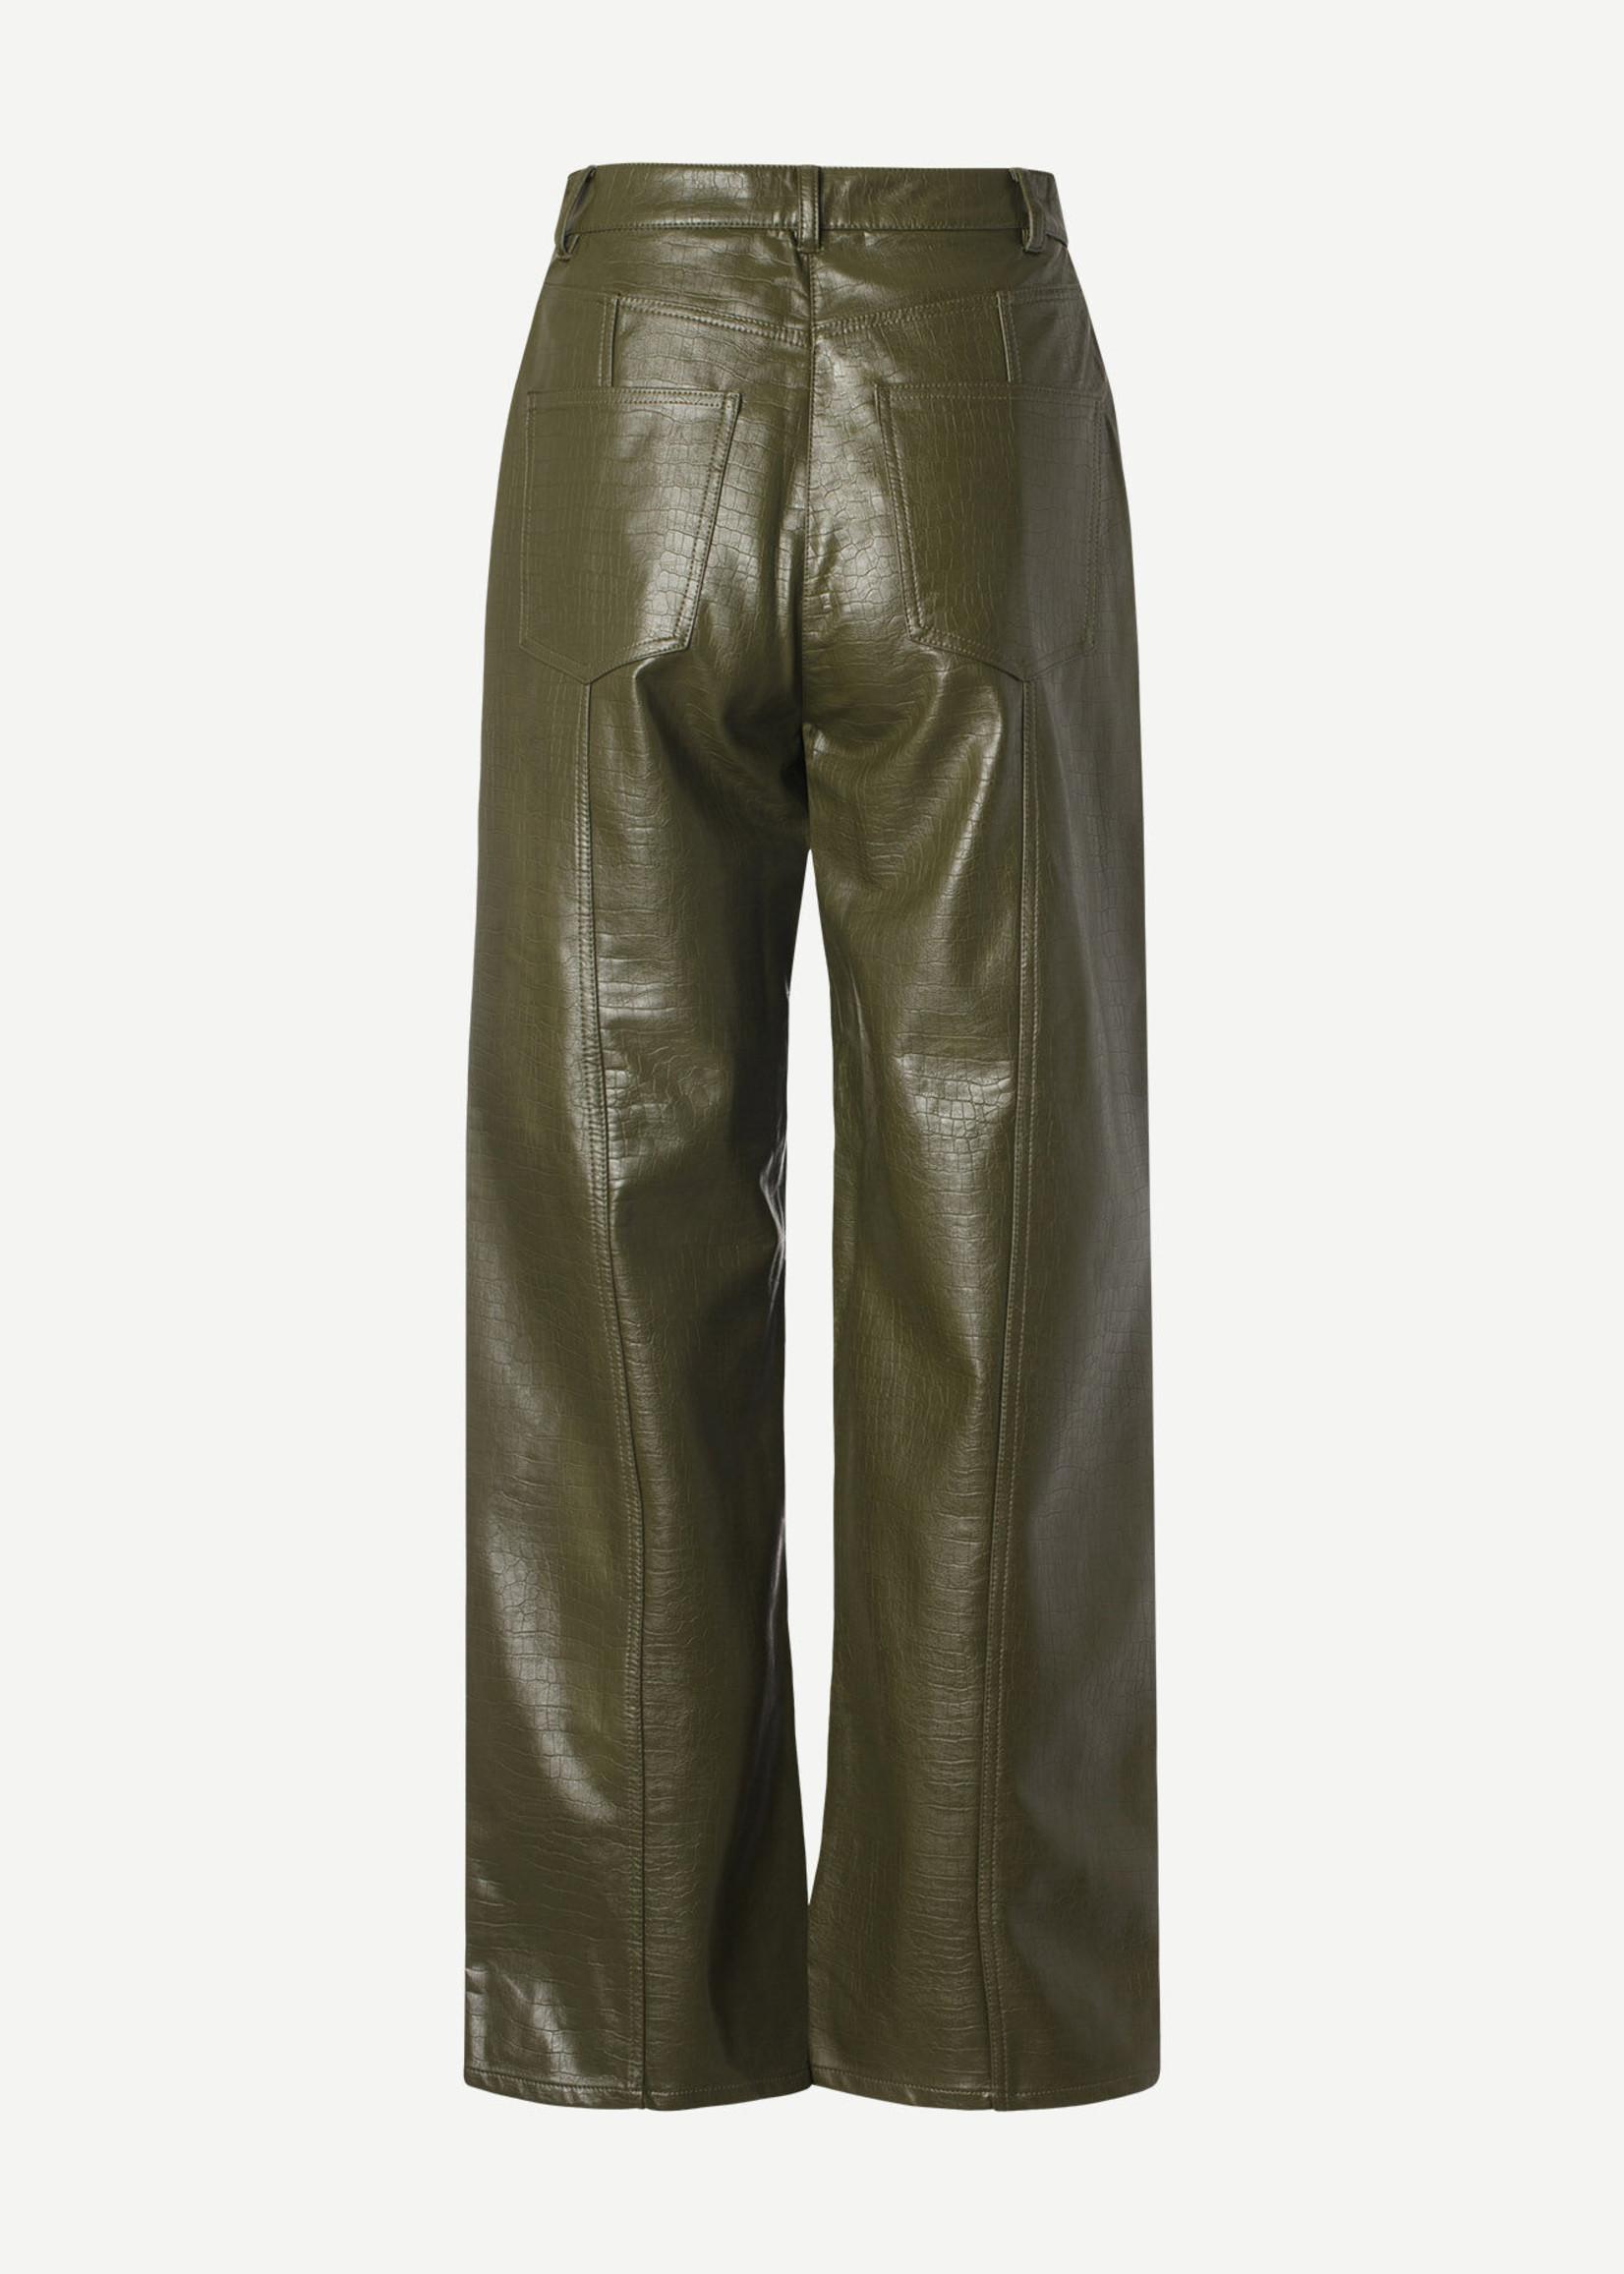 Samsoe & Samsoe Novah Trousers 13178